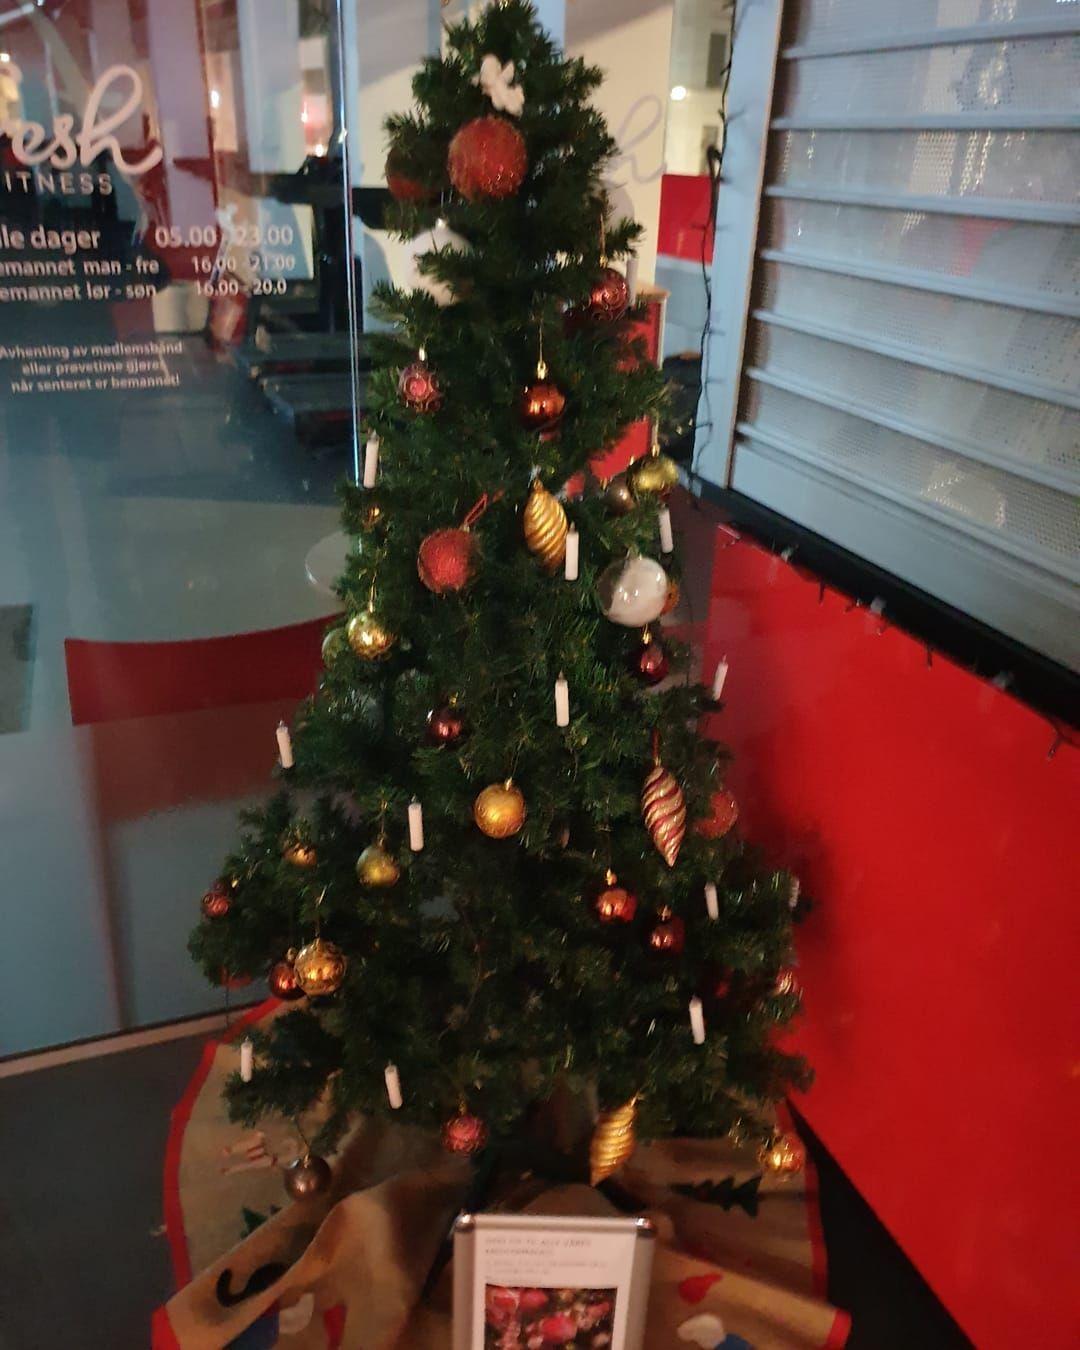 Treningsglede Trening Fitness Workout Treningsforum Gym Styrketrening Treningsinspirasjon Aktivejenter Akti Holiday Decor Workout Plan Christmas Tree